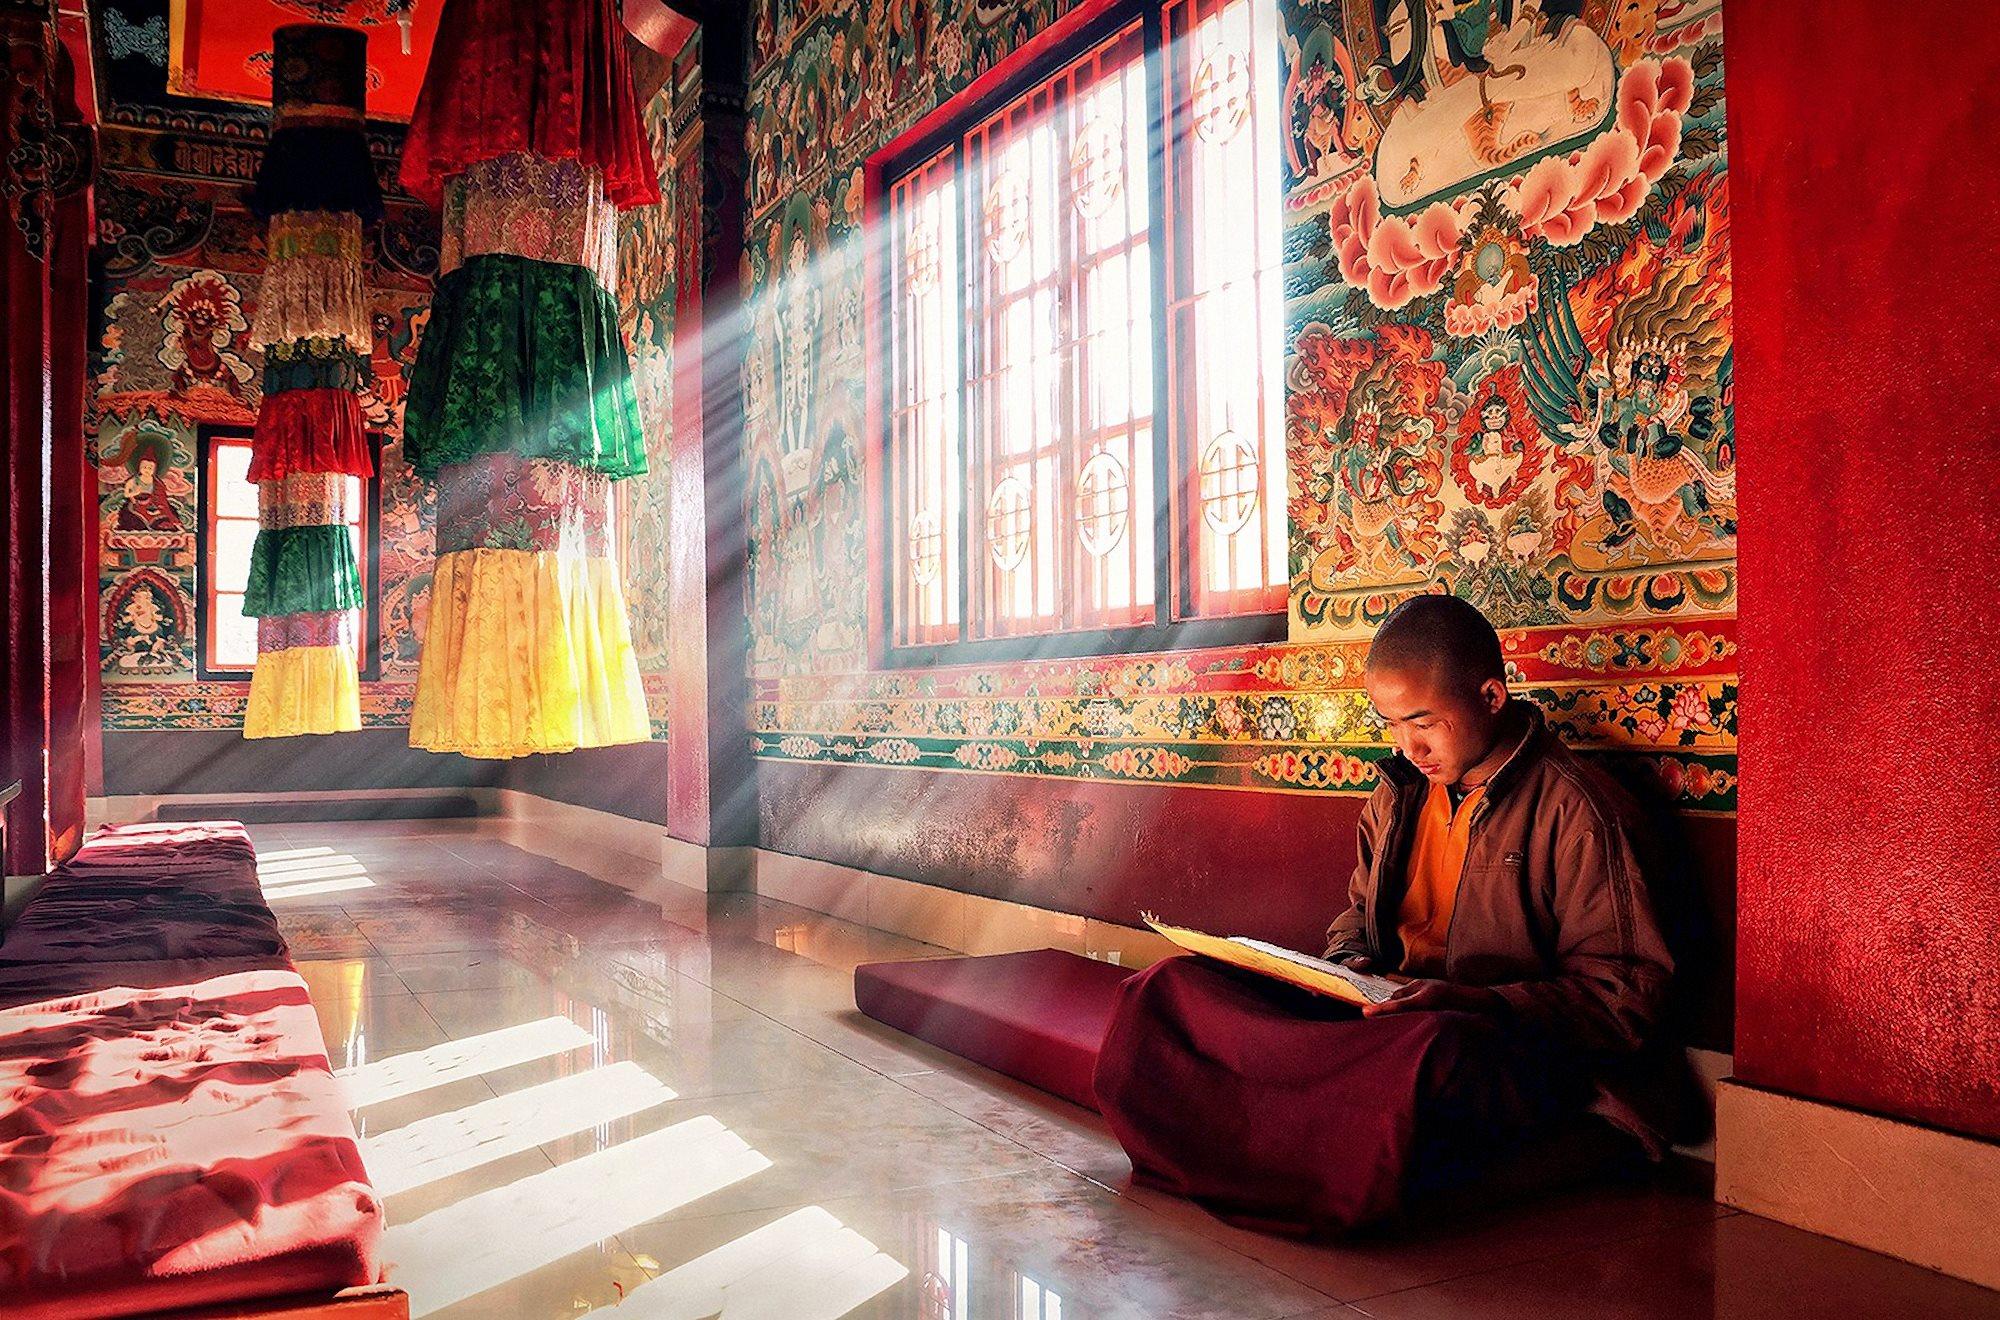 00 Yuri Biryukov. Silence and meditation. Sikkim, India. 2015